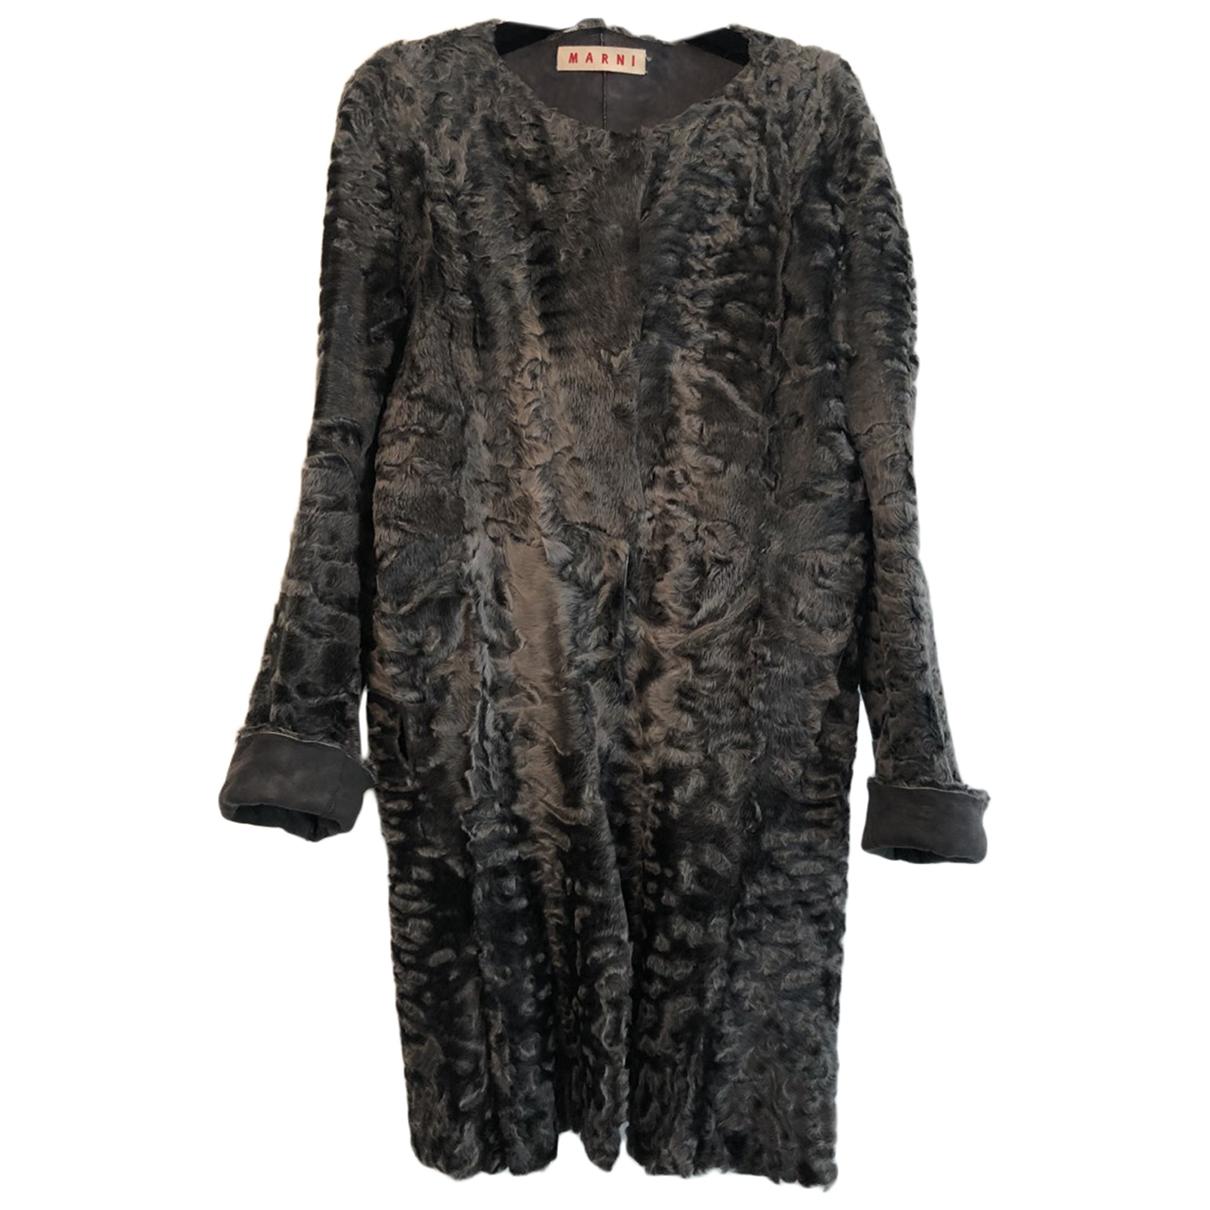 Marni \N Grey Astrakhan coat for Women 42 IT